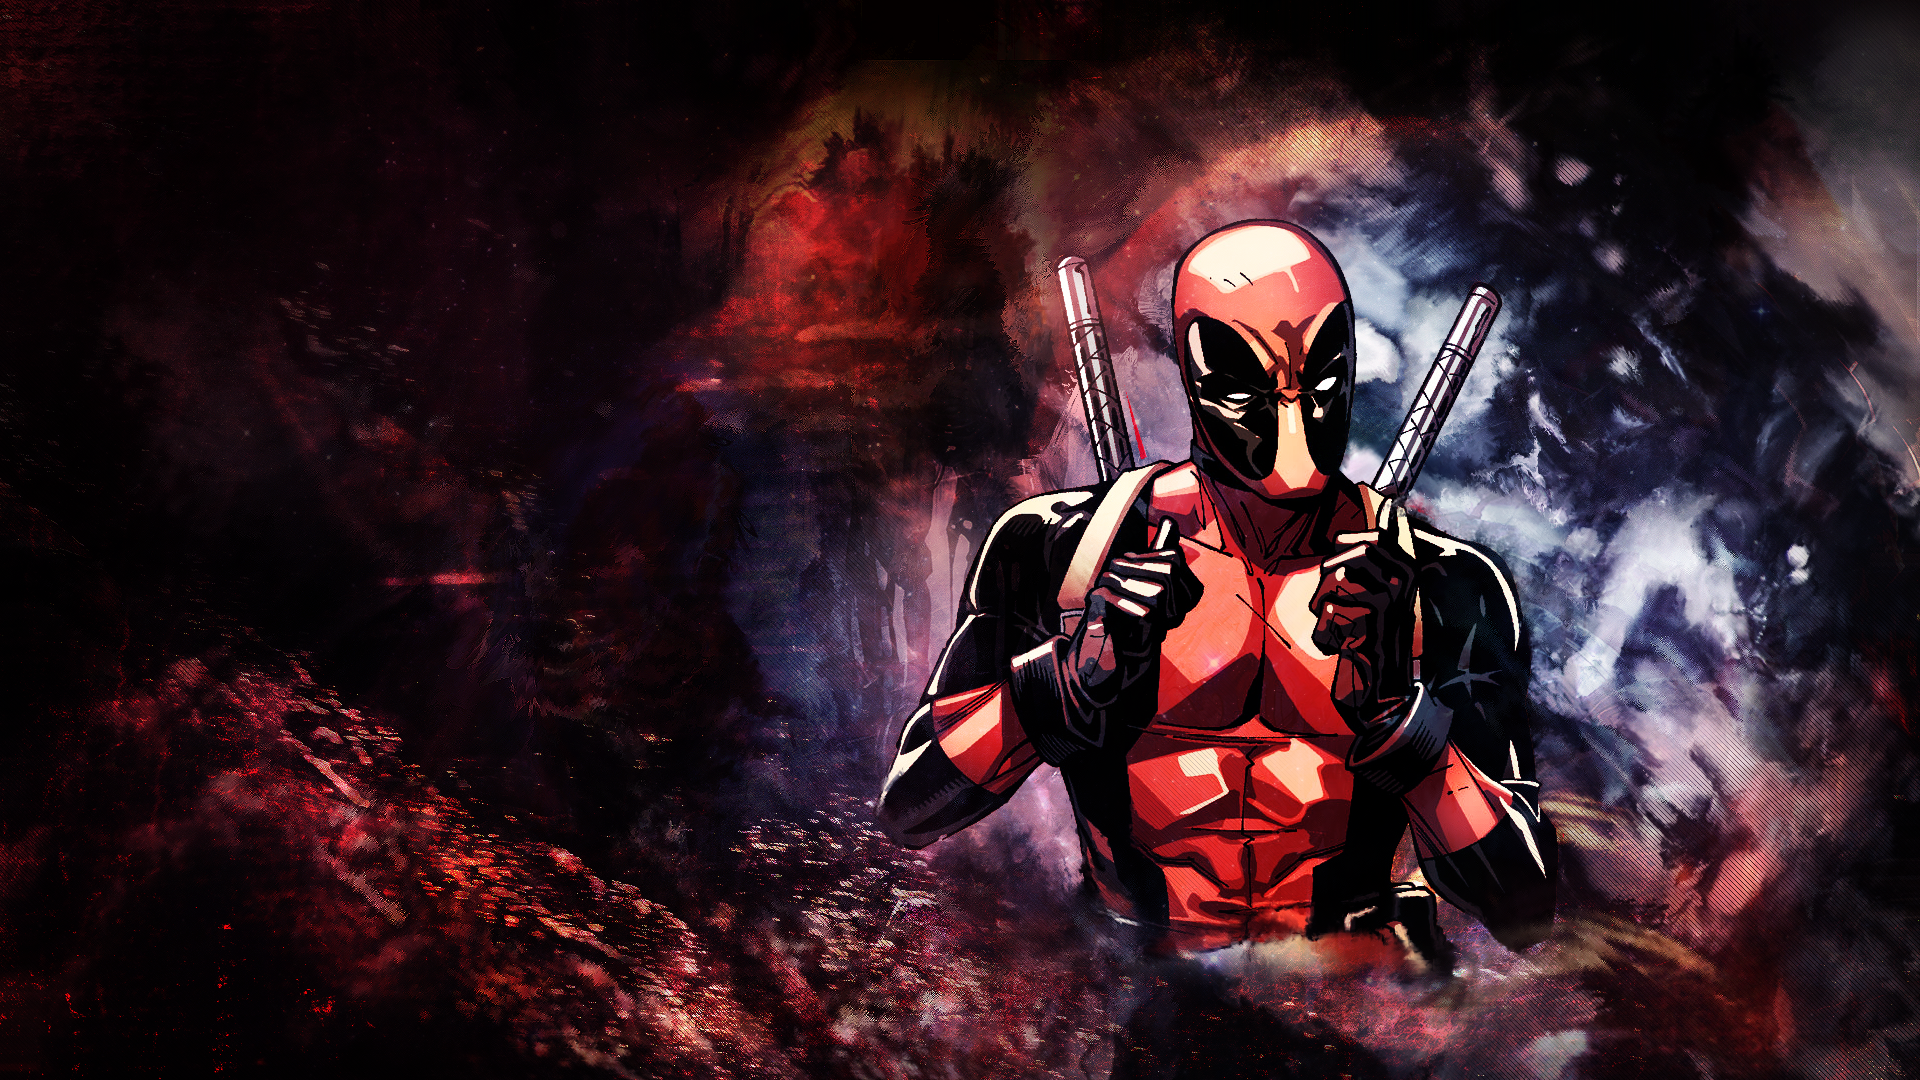 Deadpool Wallpaper 1920x1080 by PandaSeno on DeviantArt